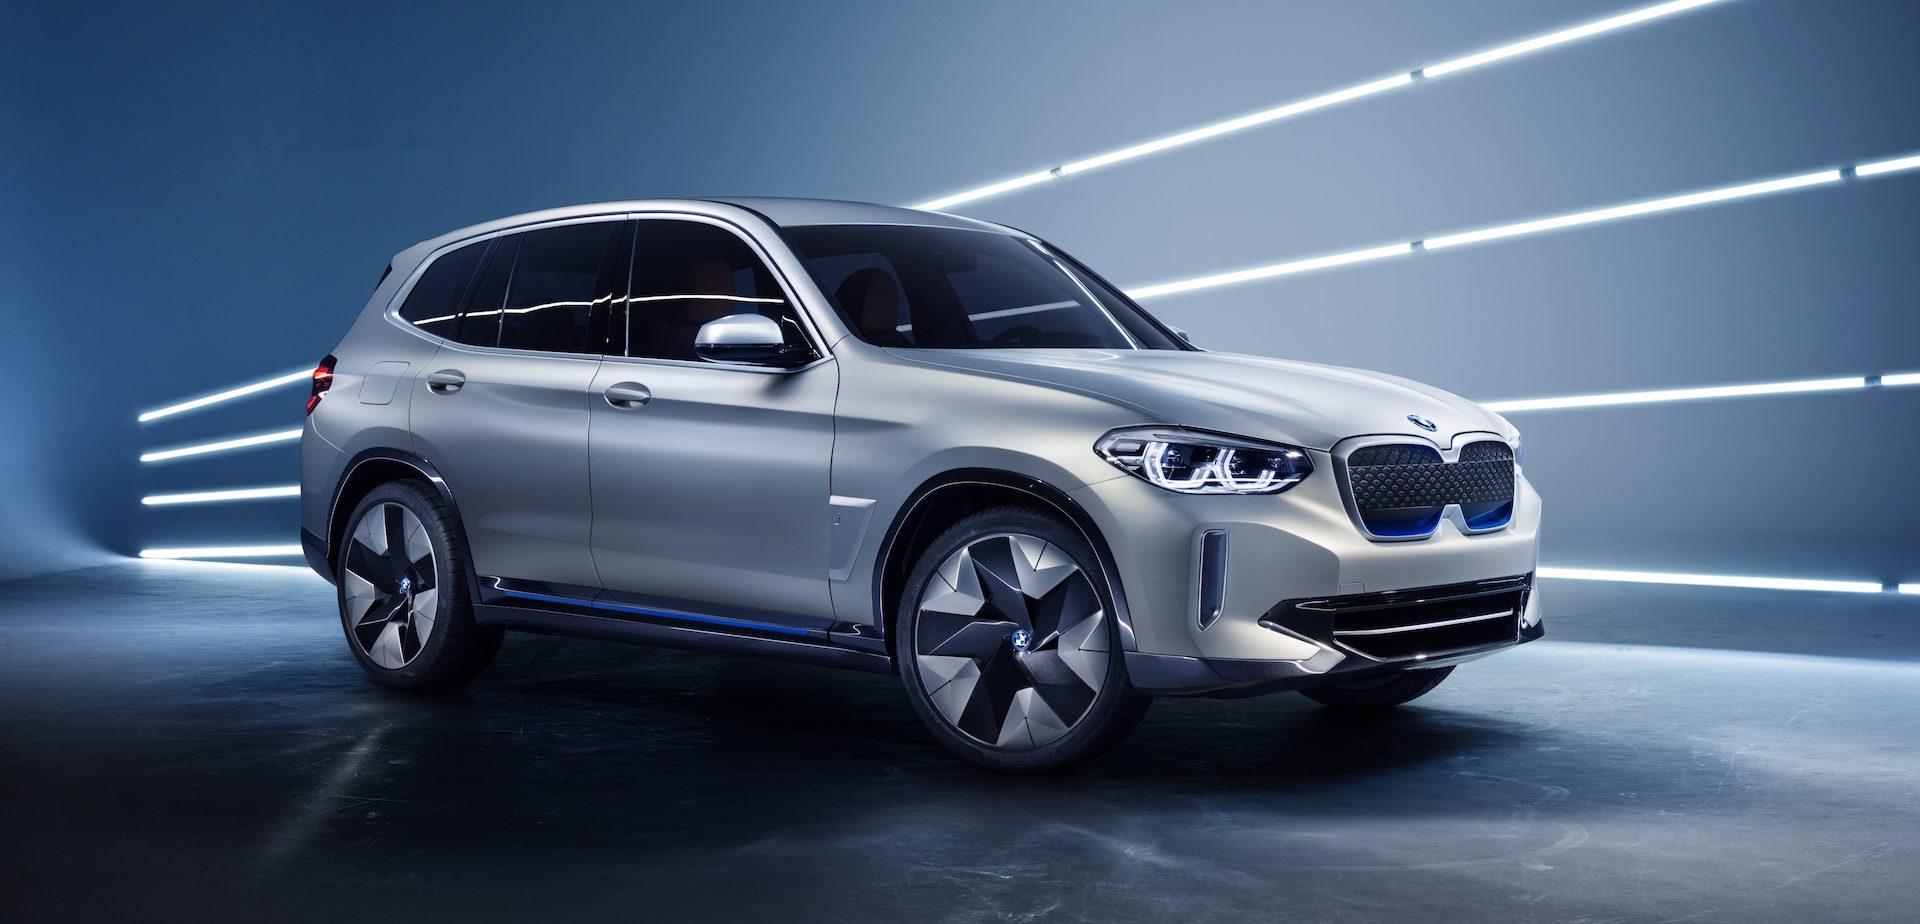 Koncept elektrického SUV BMW iX3